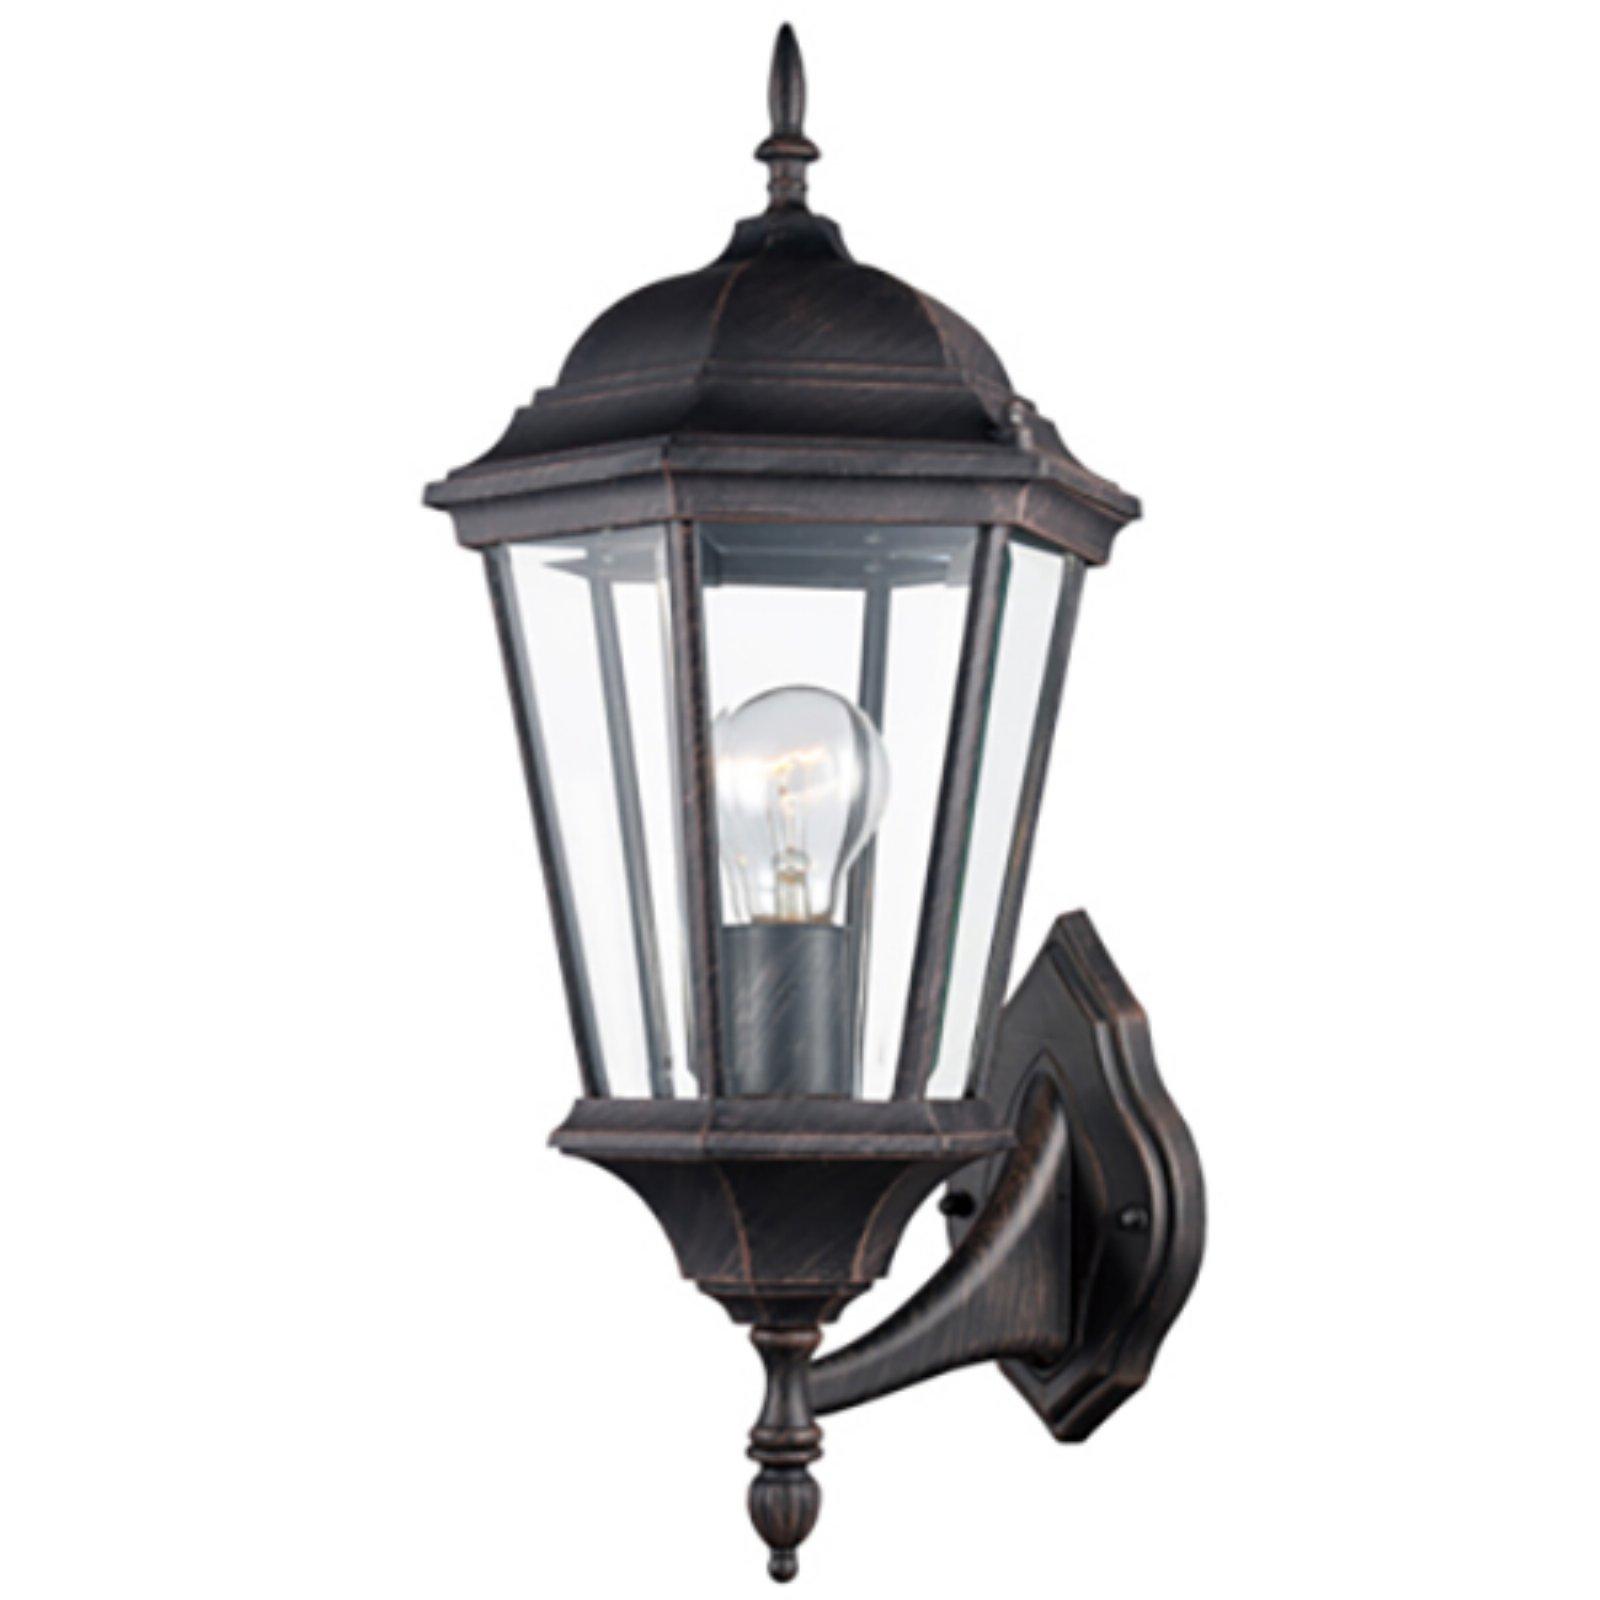 Trans Globe Lighting San Rafael 4250 Outdoor Wall Lantern